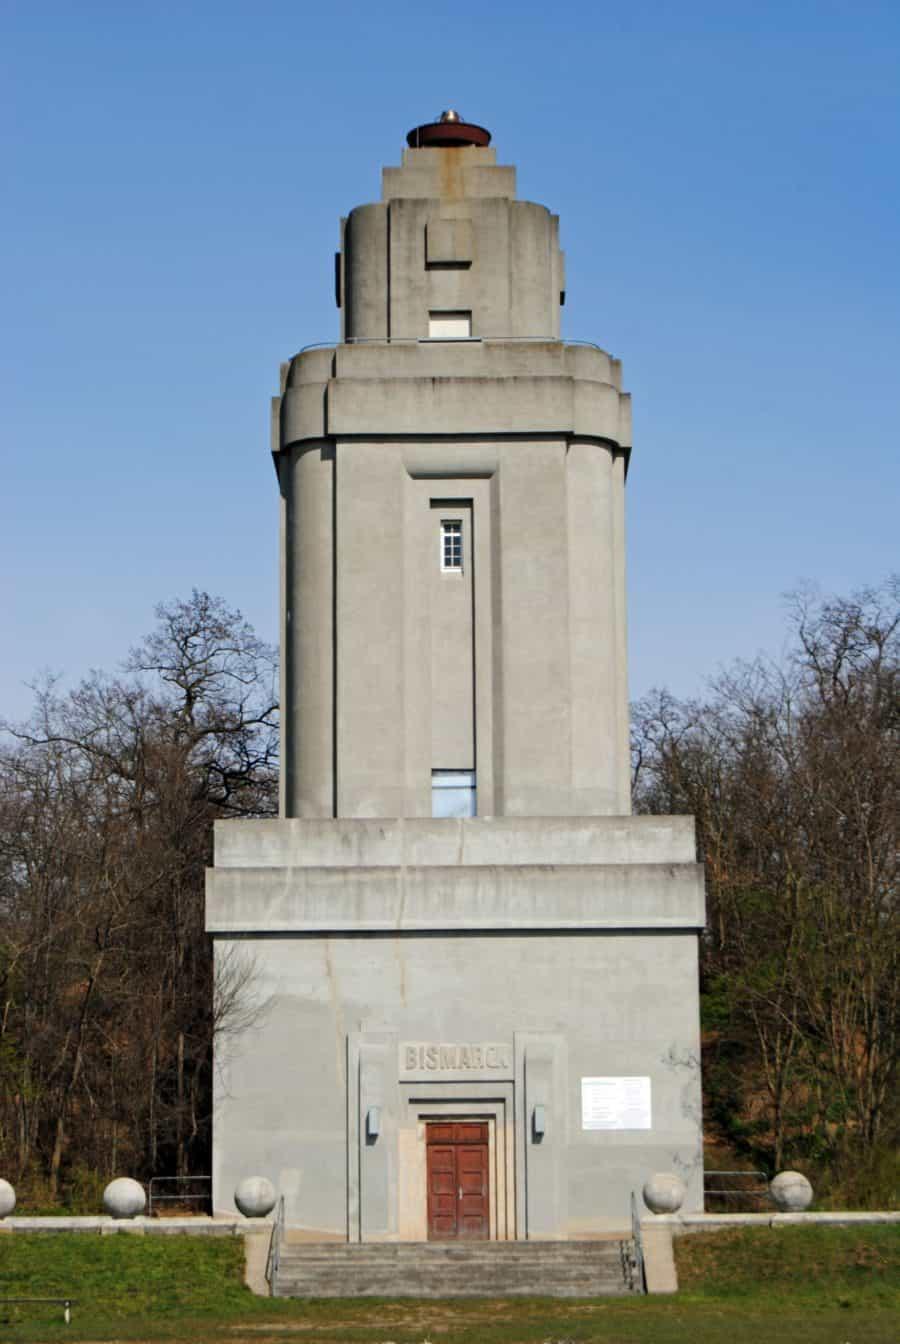 Blick auf den Bismarckturm